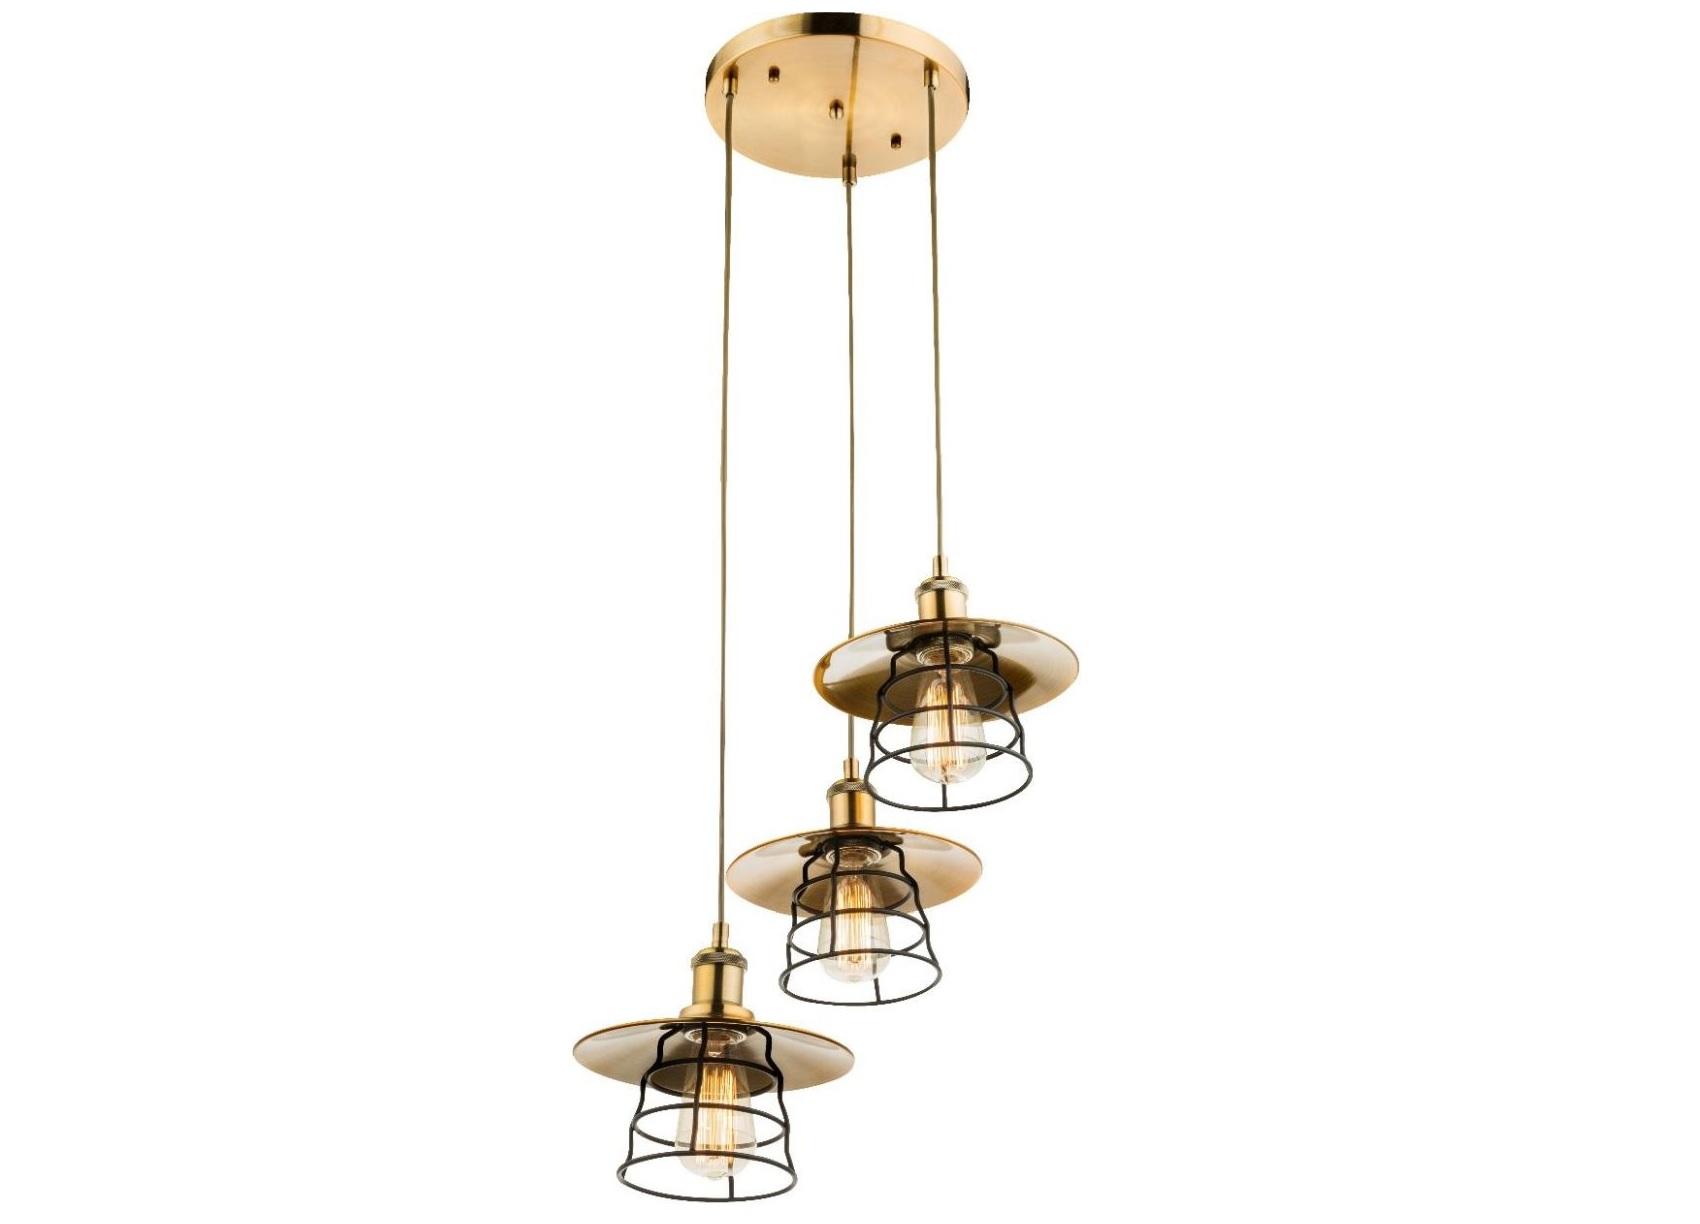 Светильник подвеснойПодвесные светильники<br>&amp;lt;div&amp;gt;&amp;lt;div&amp;gt;Вид цоколя: E27&amp;lt;/div&amp;gt;&amp;lt;div&amp;gt;Мощность лампы: 60W&amp;lt;/div&amp;gt;&amp;lt;div&amp;gt;Количество ламп: 3&amp;lt;/div&amp;gt;&amp;lt;/div&amp;gt;<br><br>Material: Металл<br>Ширина см: 33<br>Высота см: 150<br>Глубина см: 33